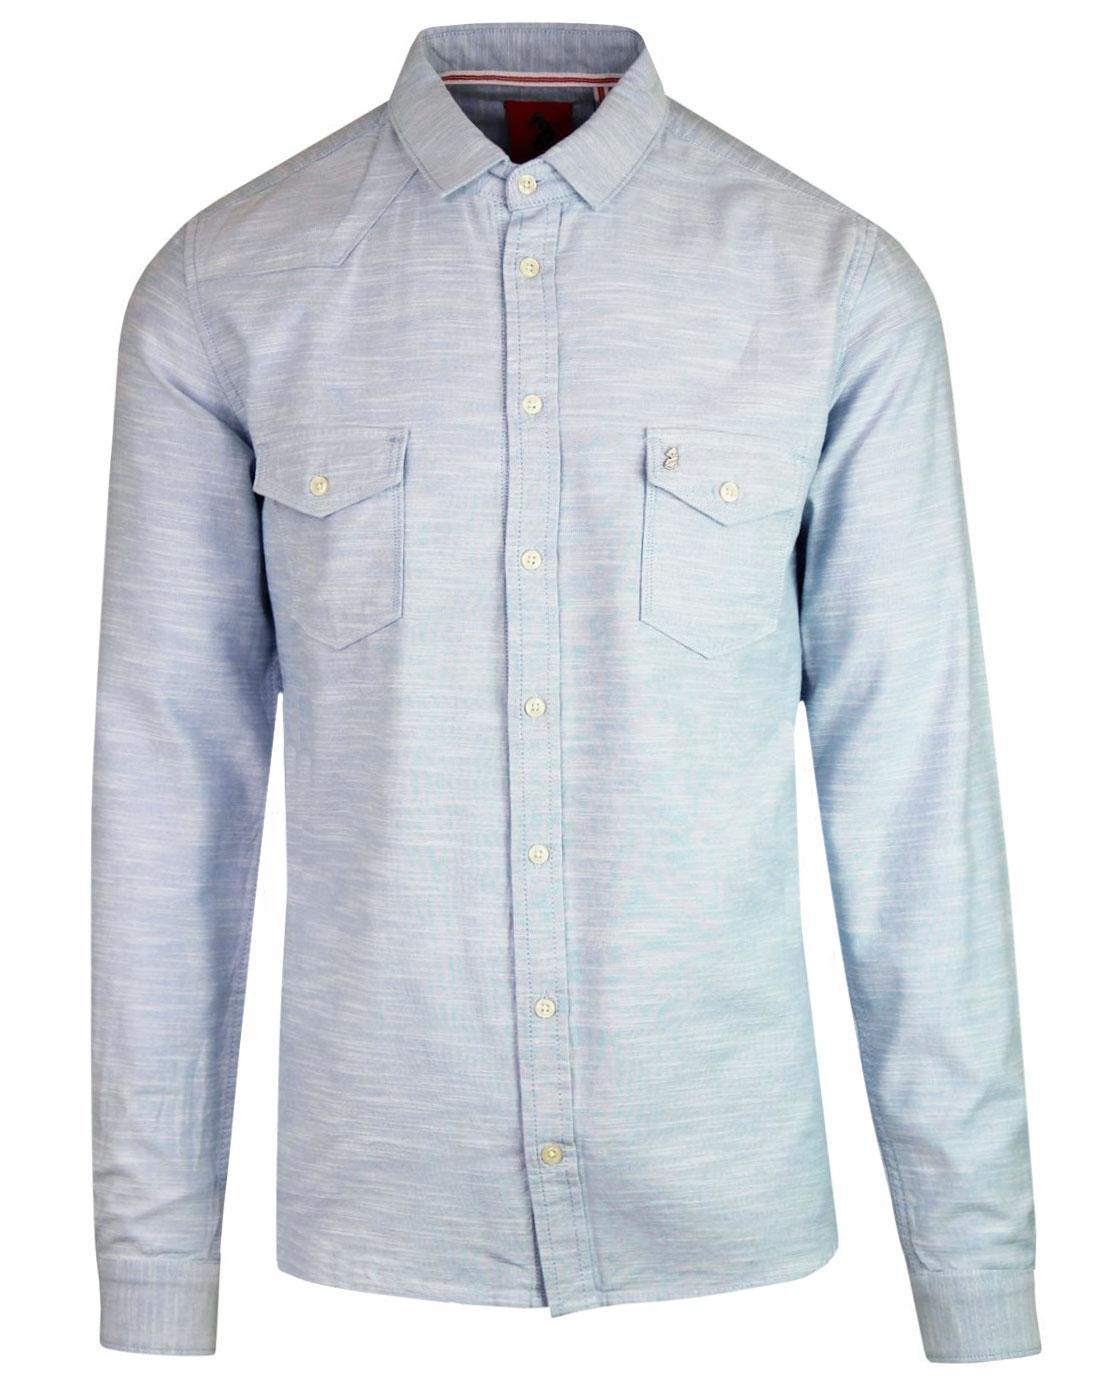 Bardon LUKE Retro Mod Space Dye 2 Pocket Shirt SKY